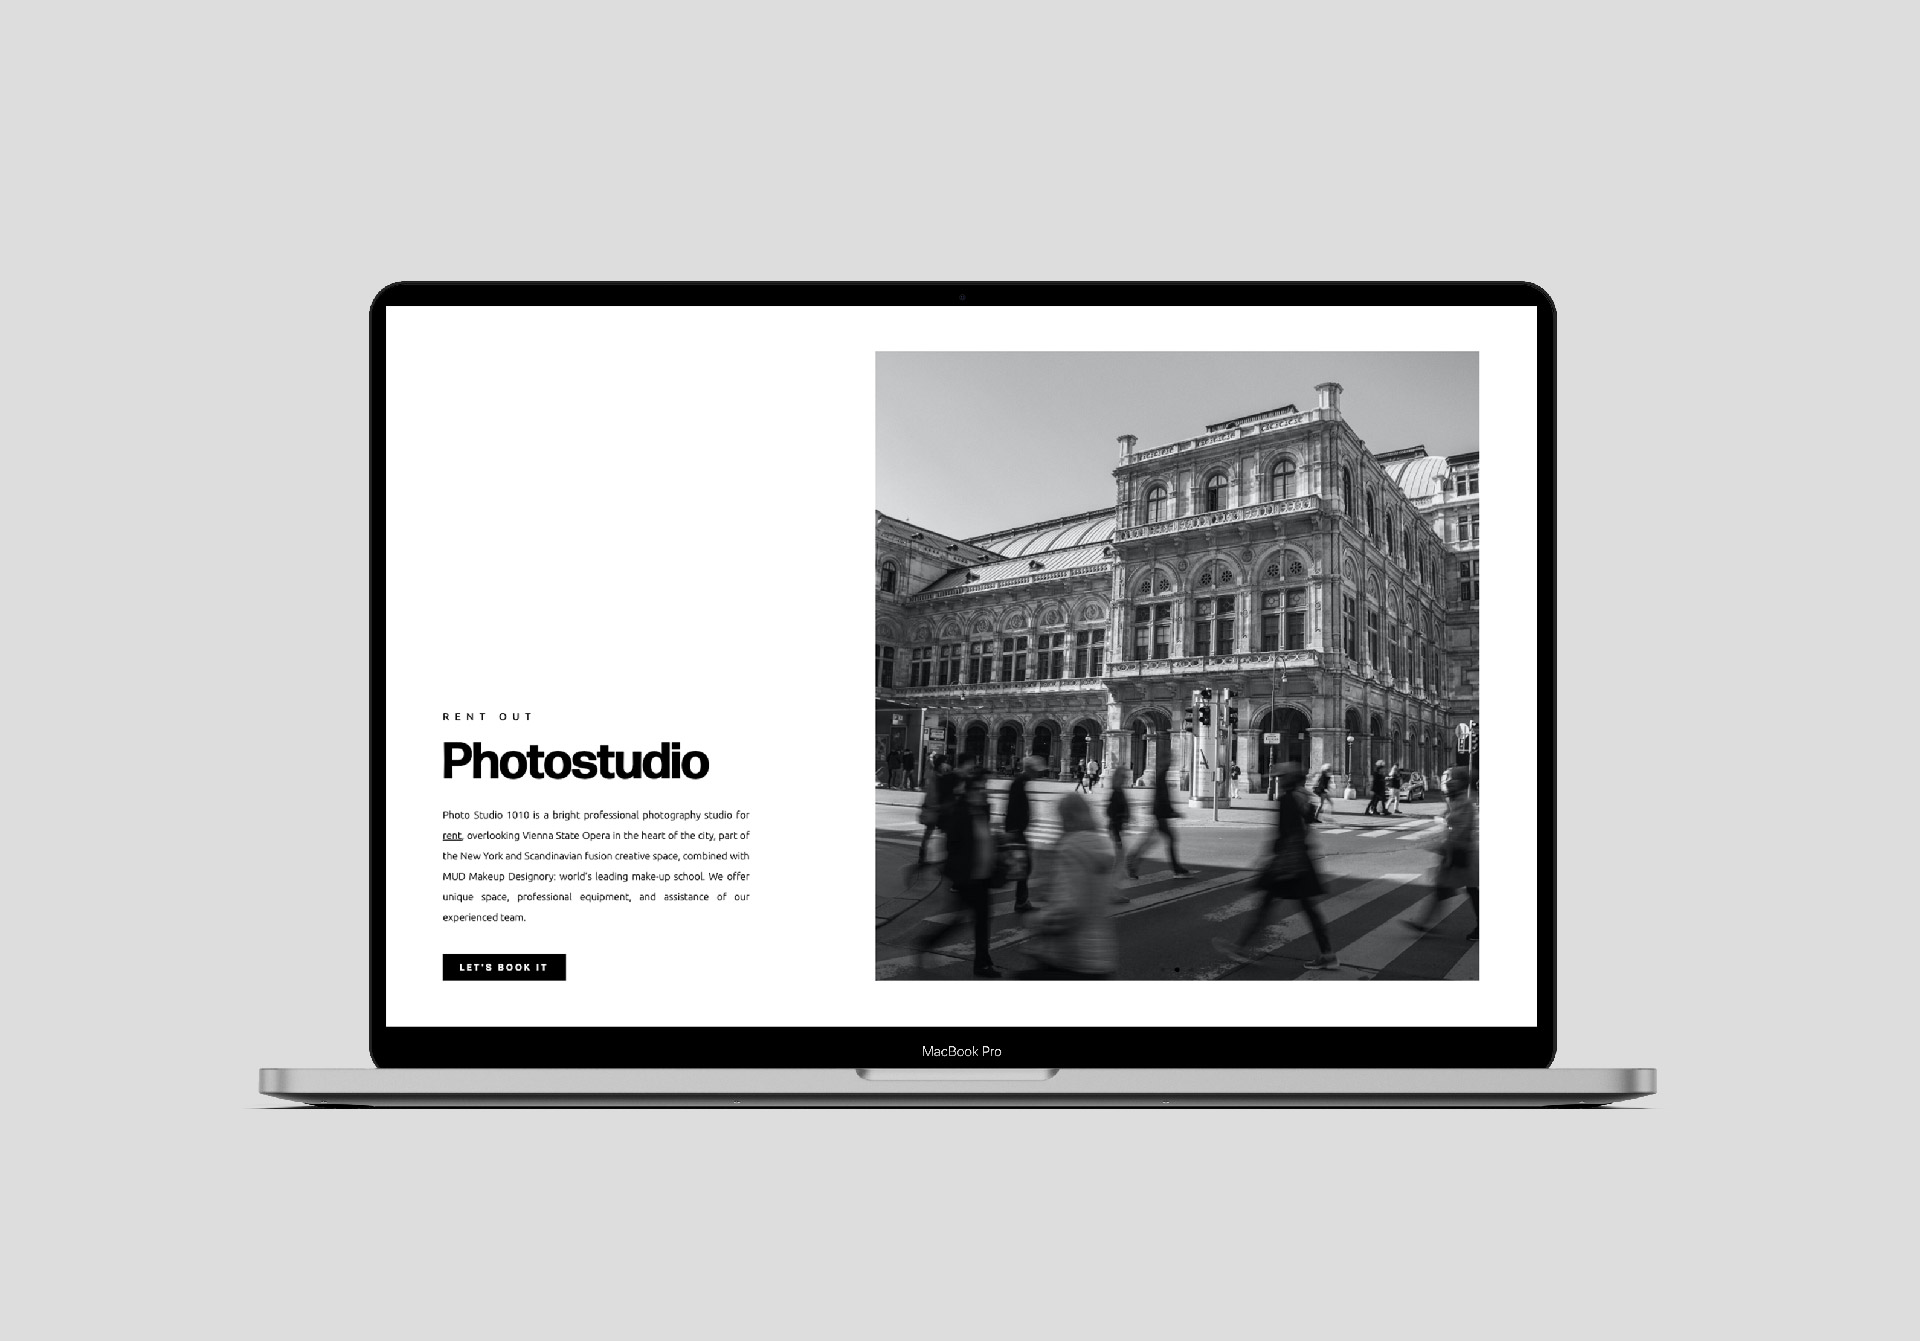 jovan lakic general condition photo studio vienna graphic website design